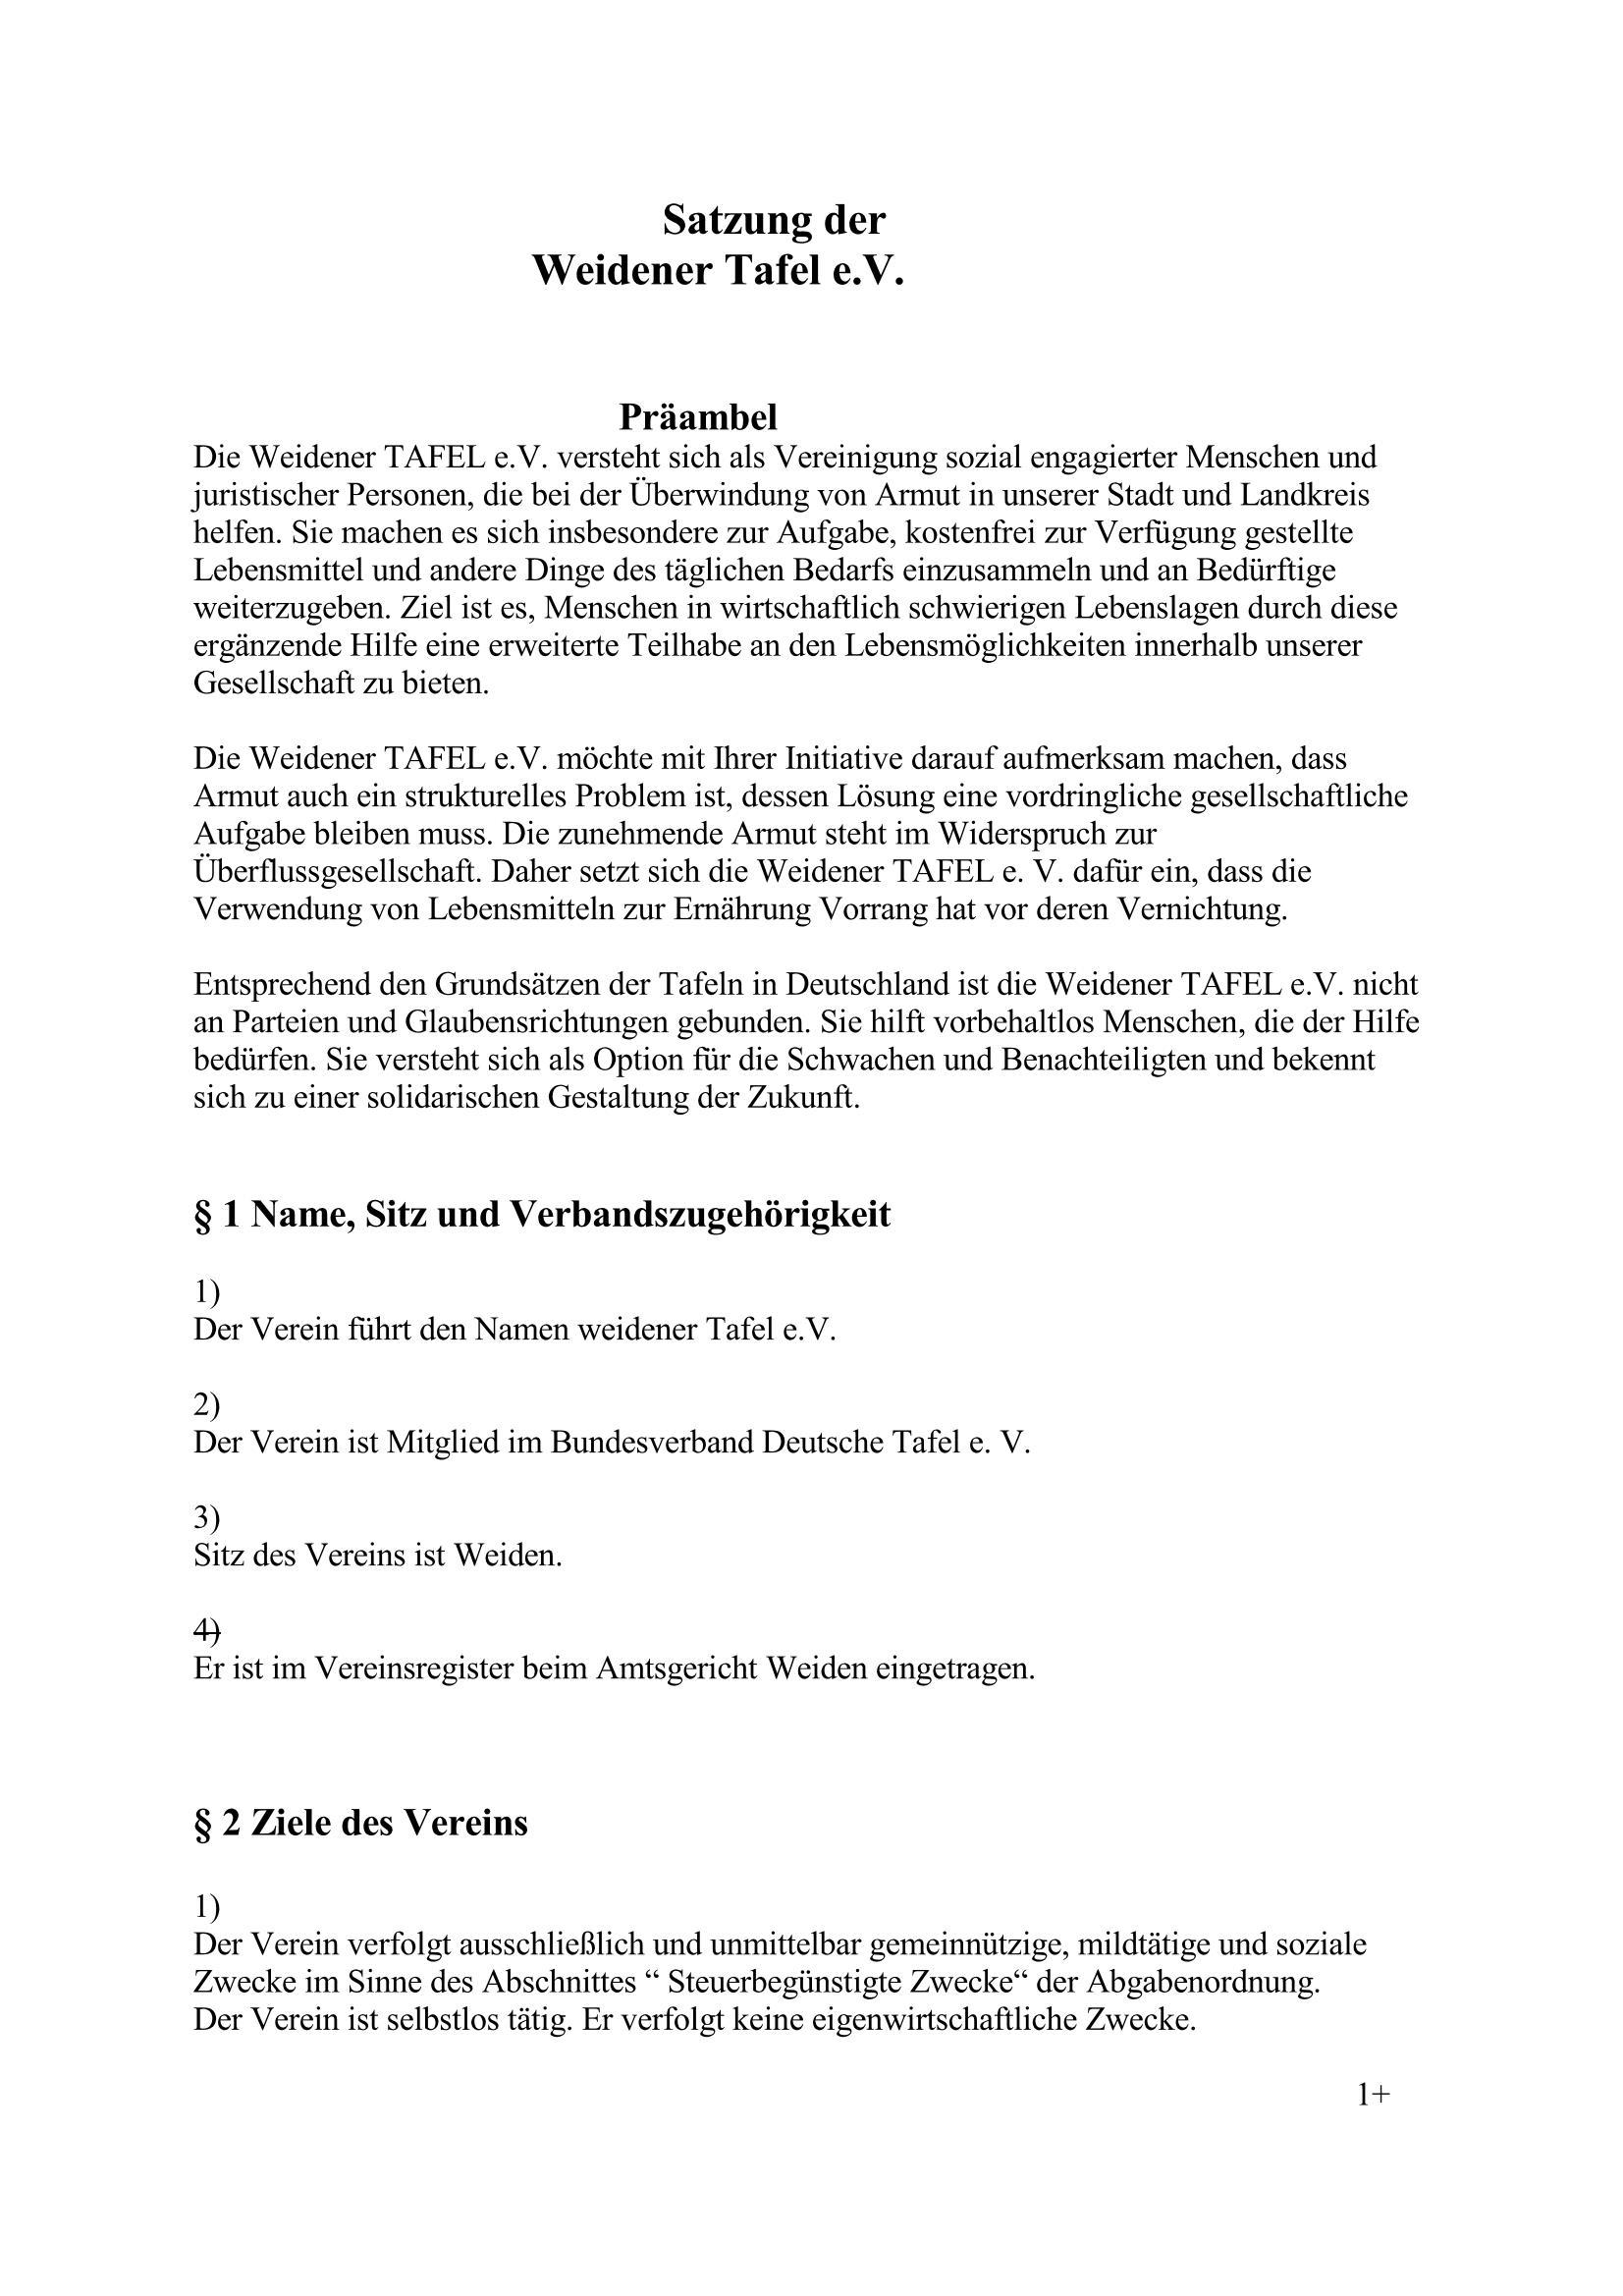 Satzung 2010.S.1